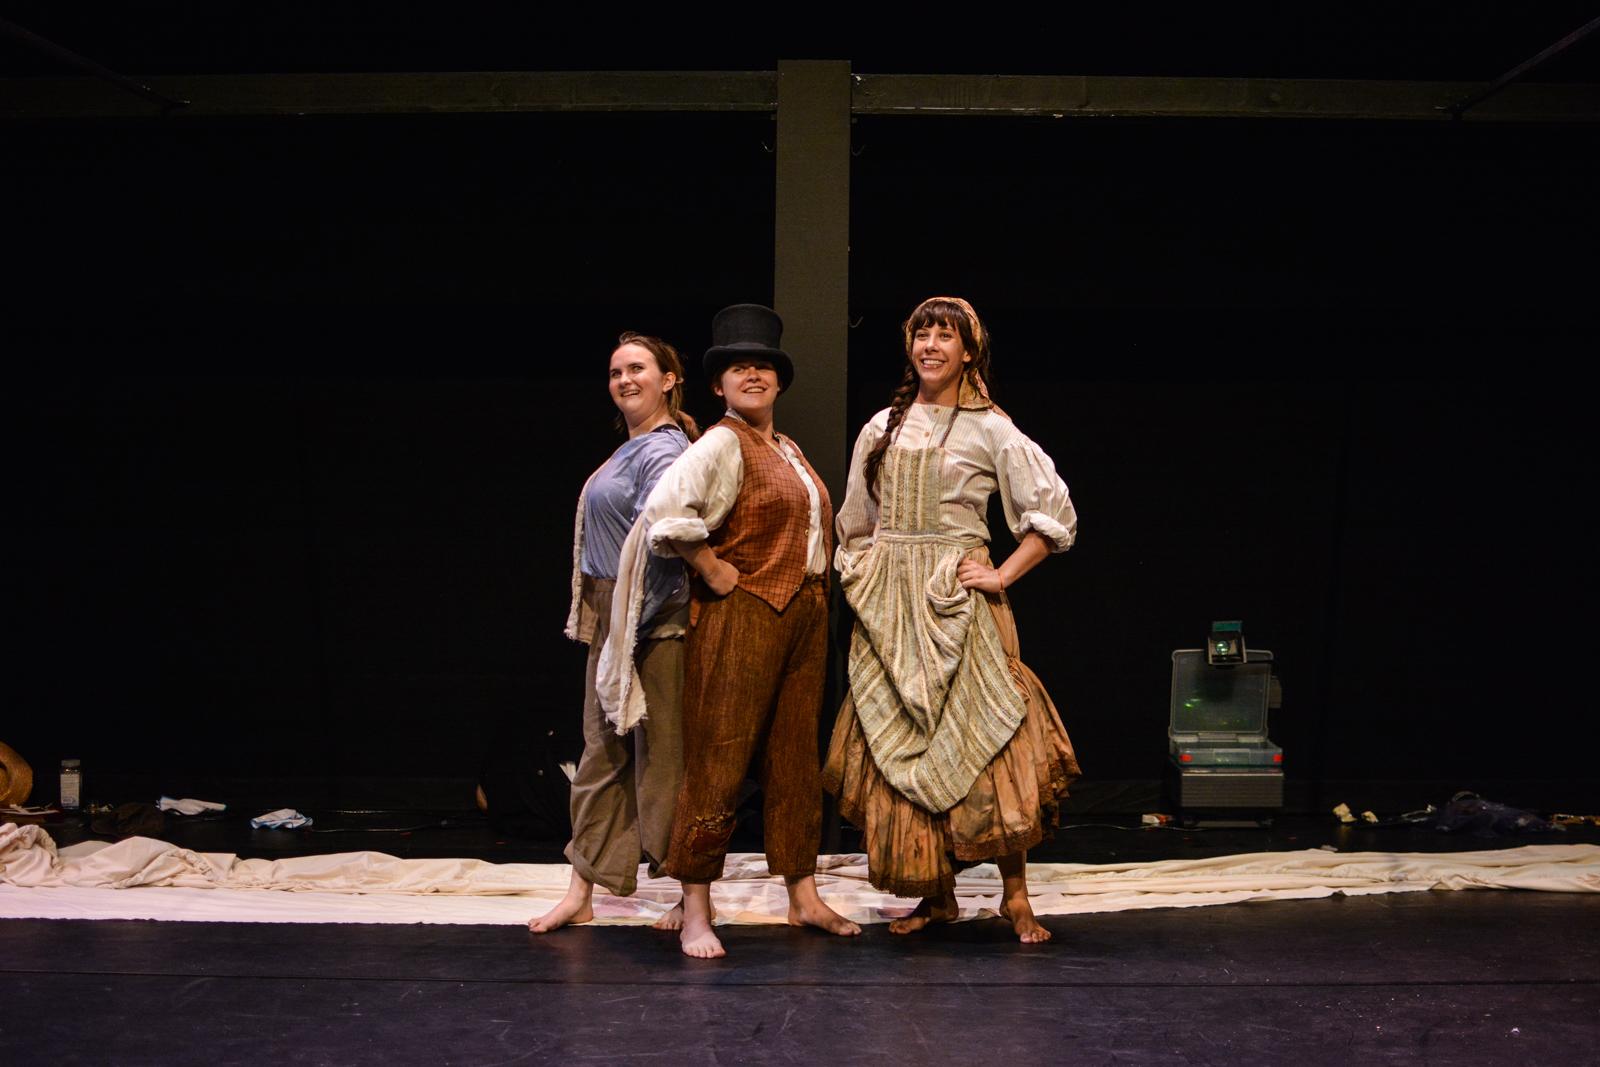 Kristina as Euphrasie with Sara Glancy and Amalia Oswald in Marvellous . Photo by Kelley Van Dilla.